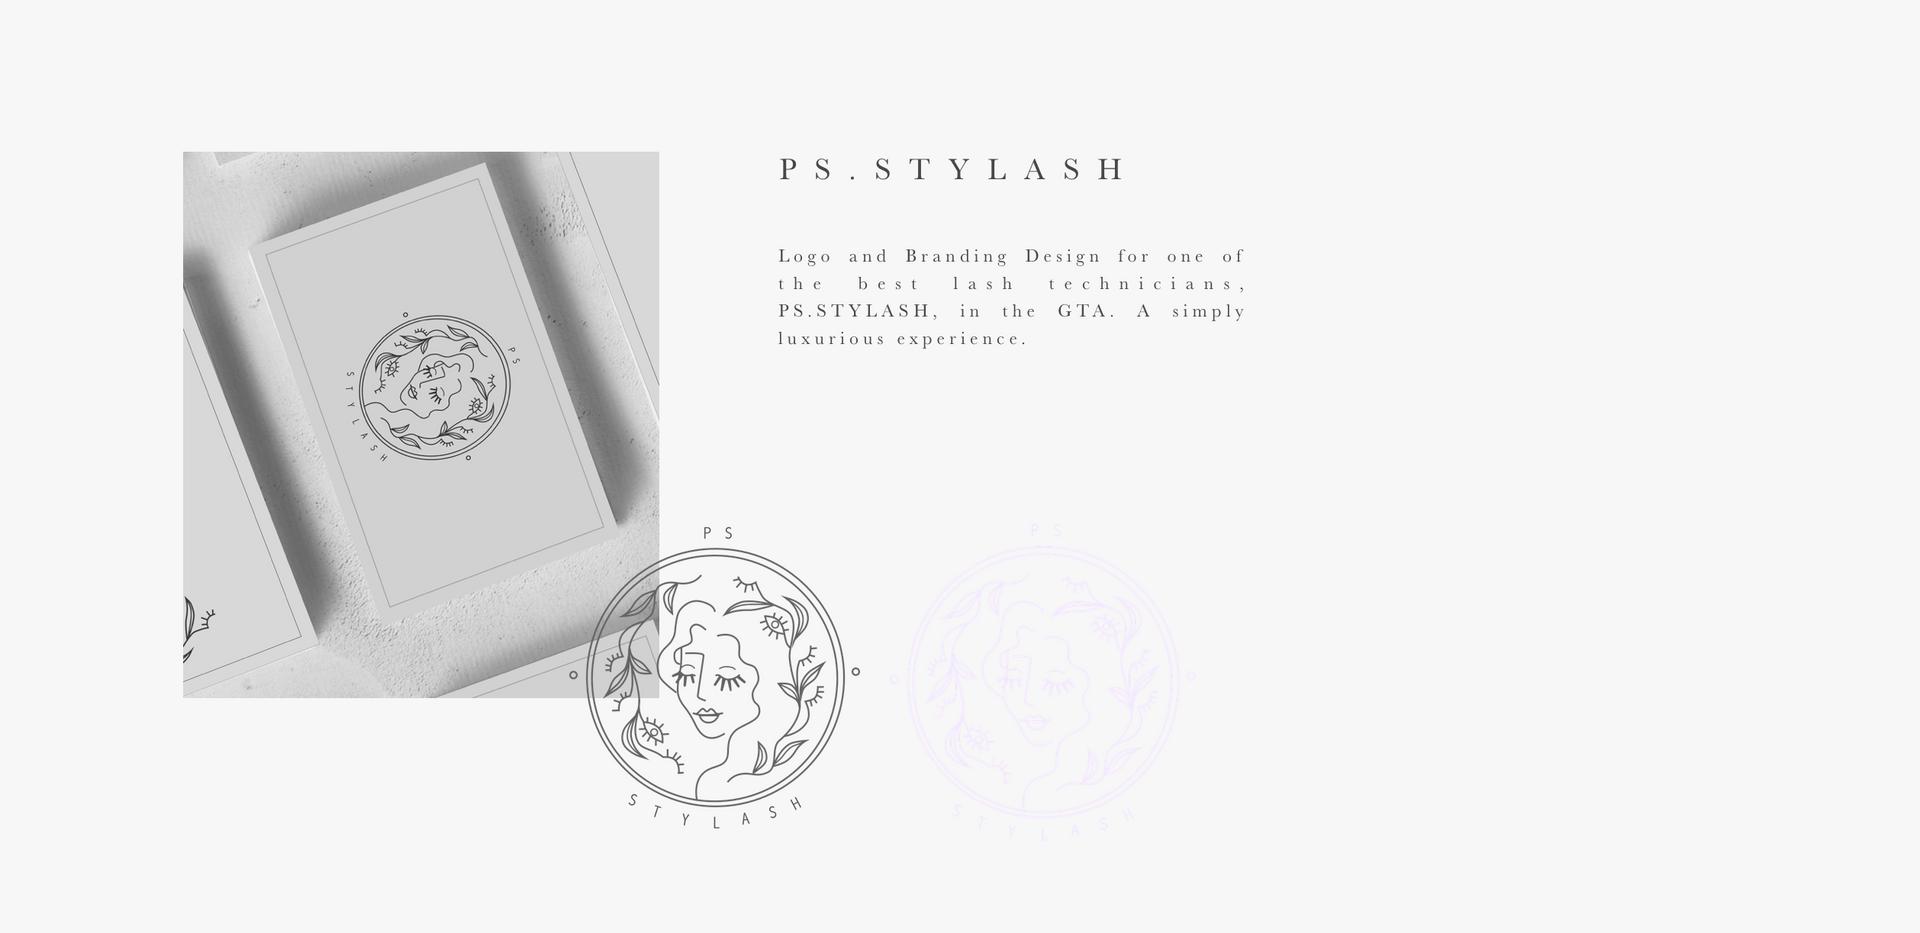 PS.STYLASH